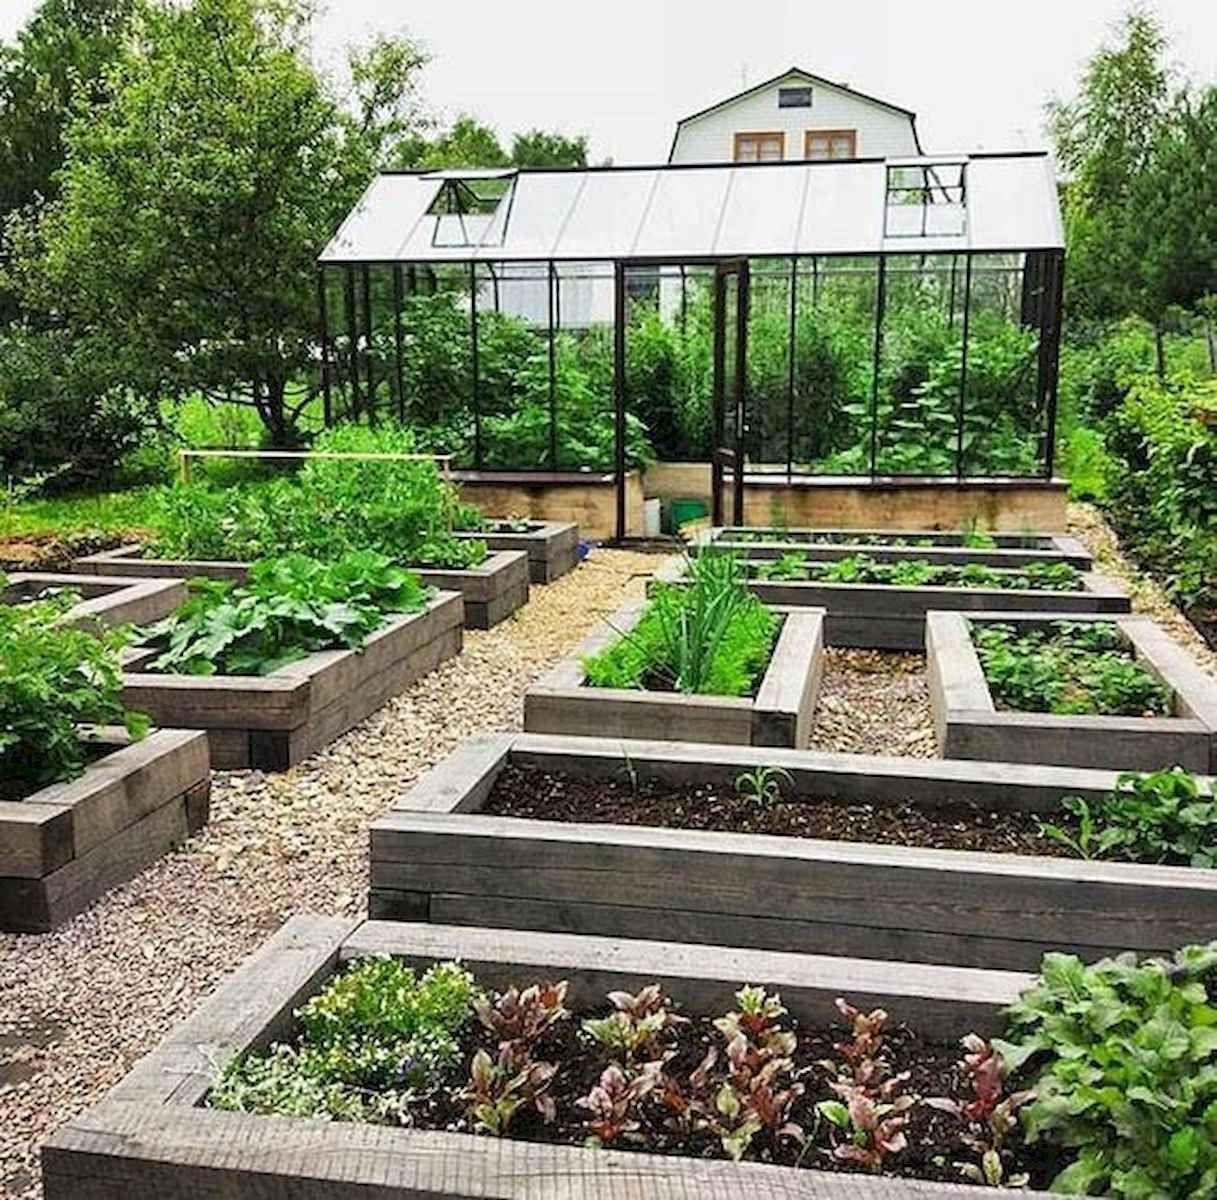 20 Fabulous Garden Design Ideas For Small Space That Looks Cool Mediterranean Garden Design Garden Layout Building A Raised Garden Backyard raised garden bed ideas